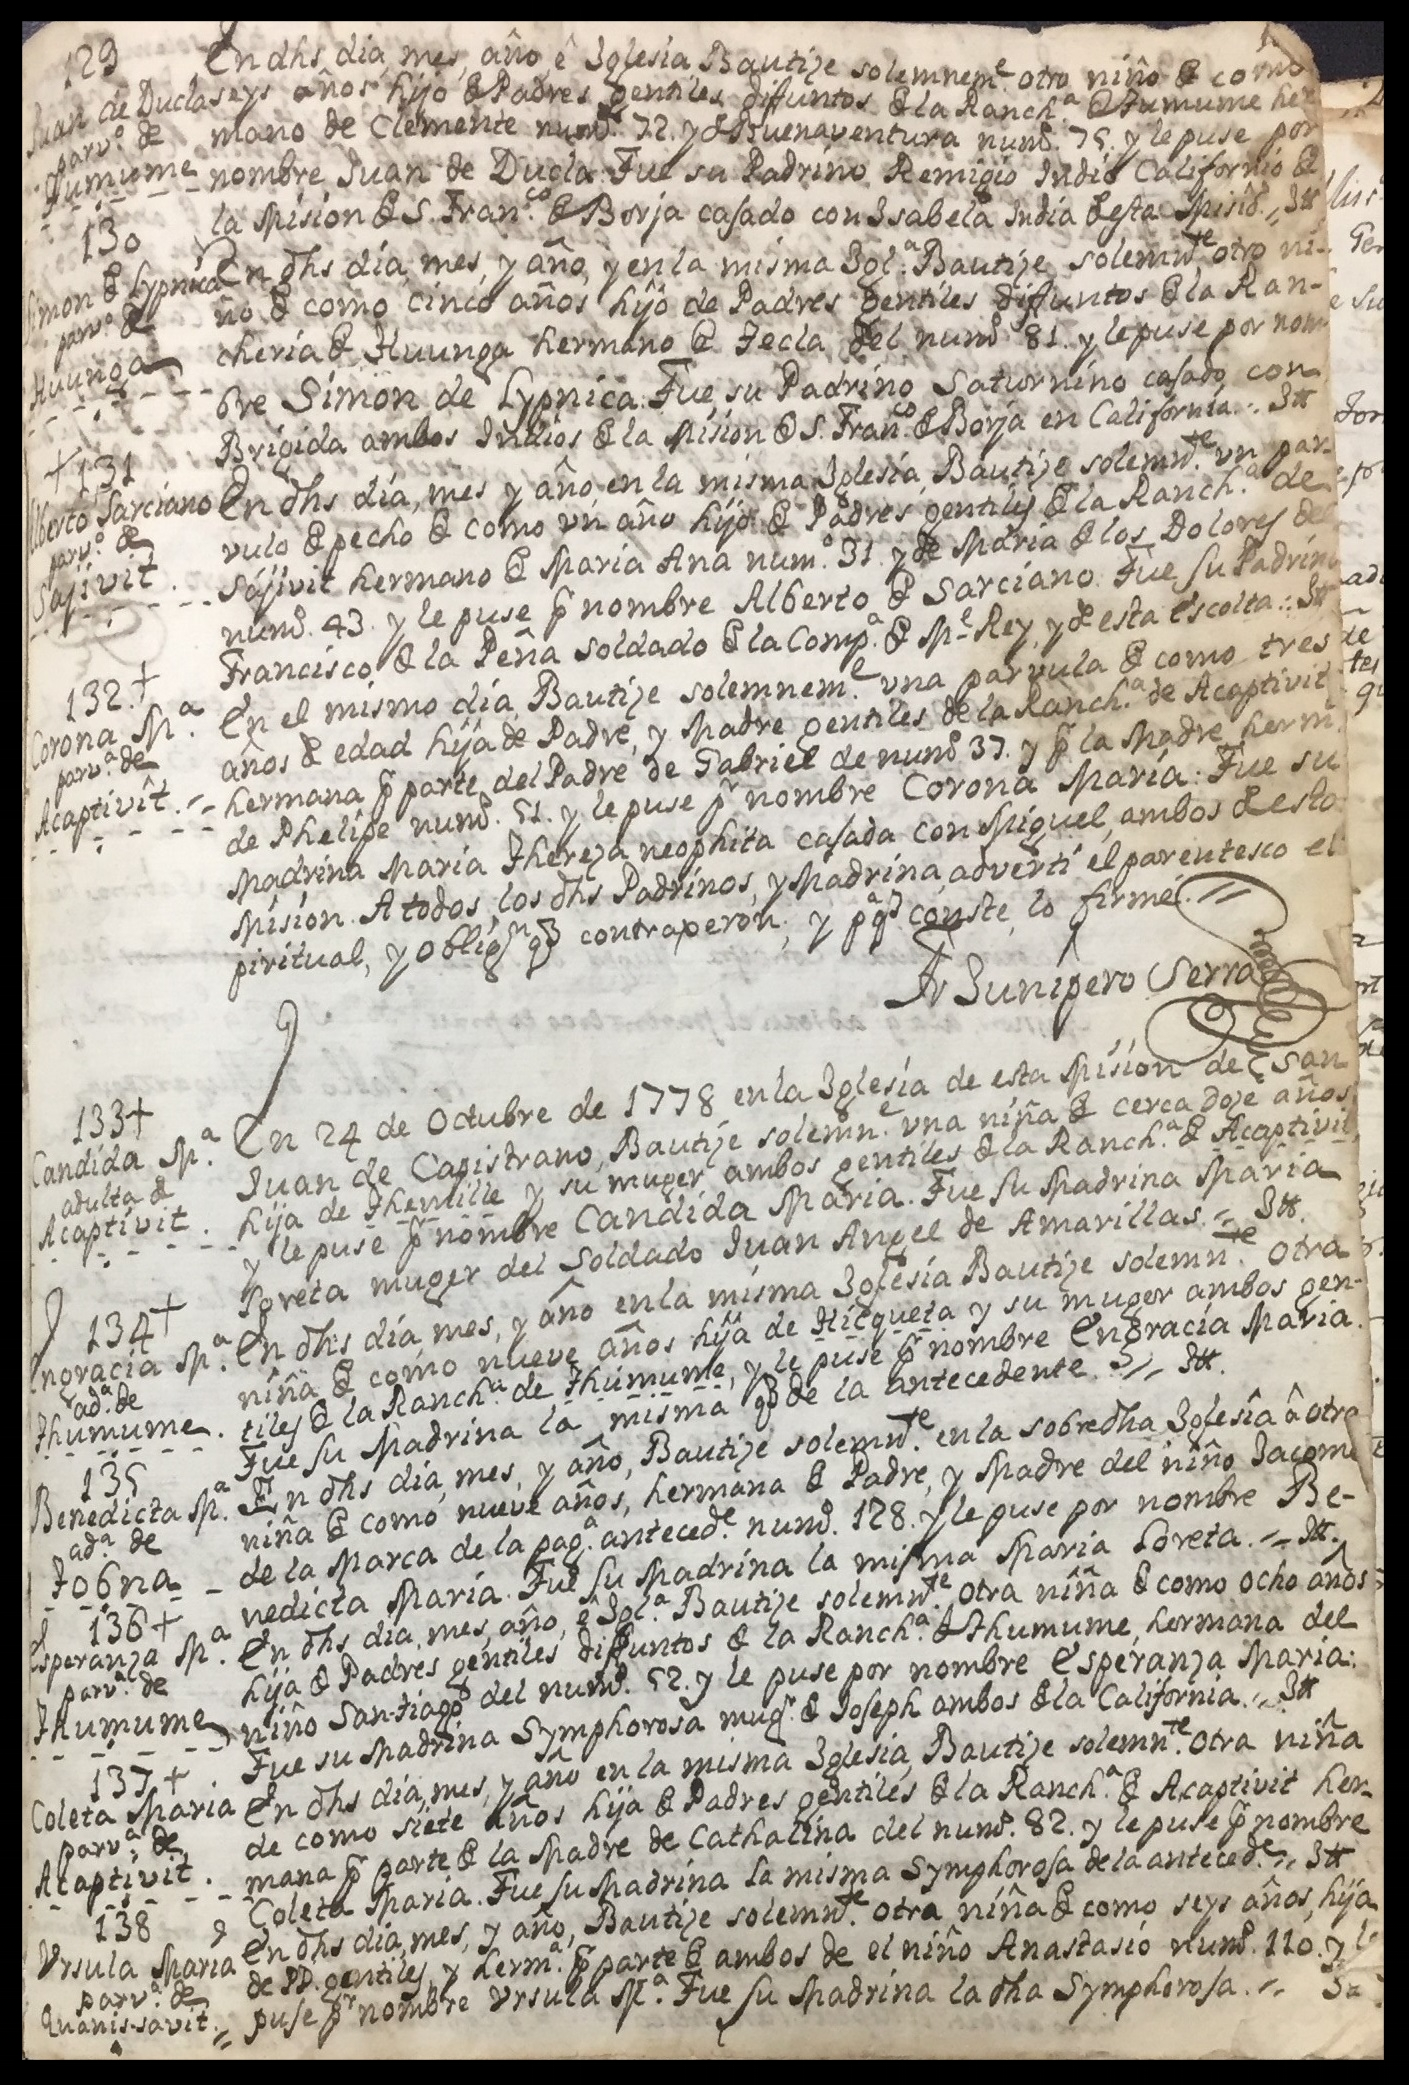 From Volume I of the archival Baptismal Registry of Mission San Juan Capistrano - 1778 - Serra's own Baptismal notation and signature - (c) Mission San Juan Capistrano